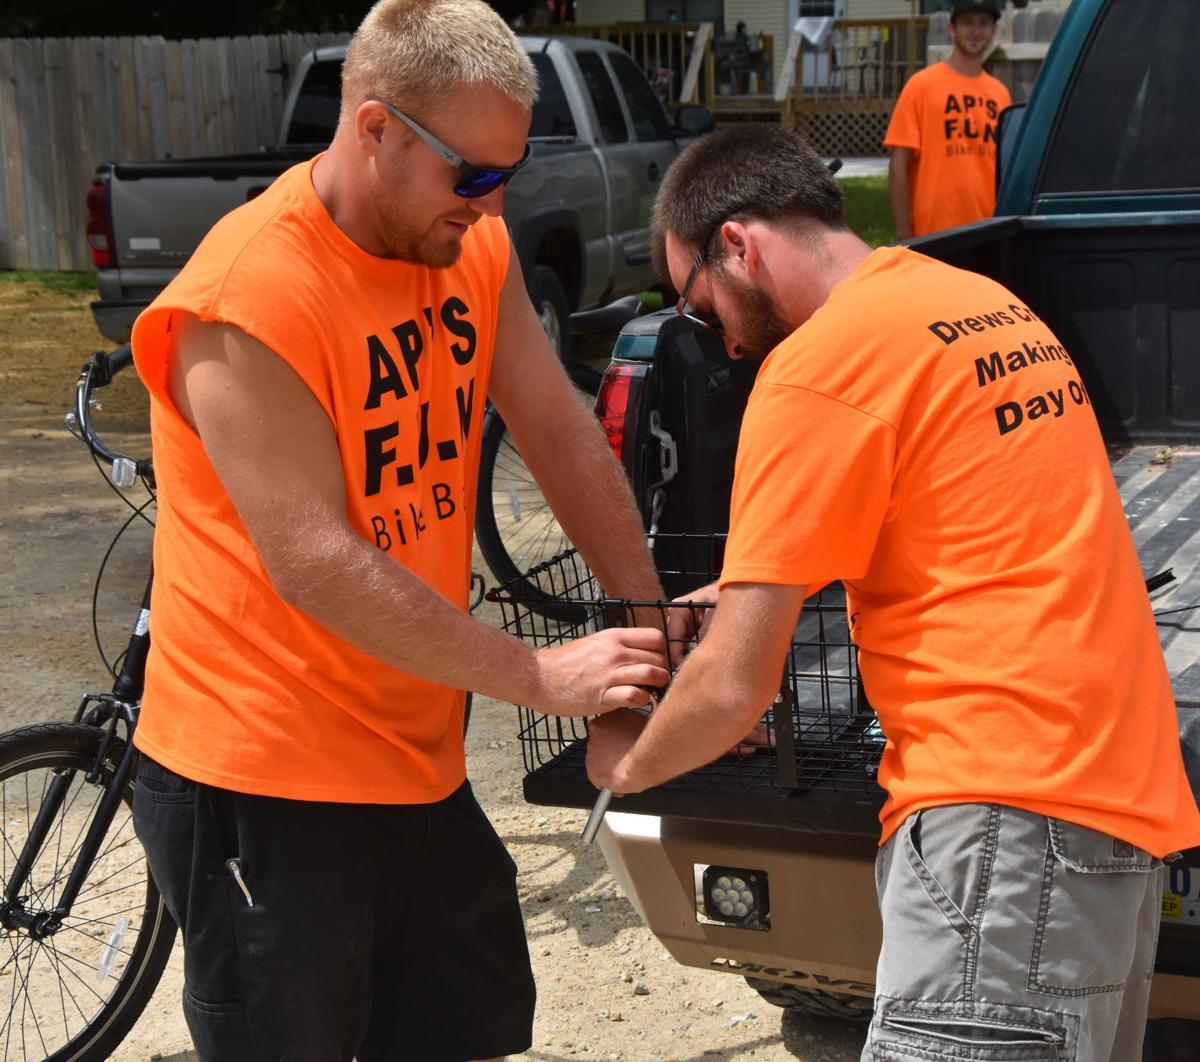 Bike ride, pub crawl benefits local families